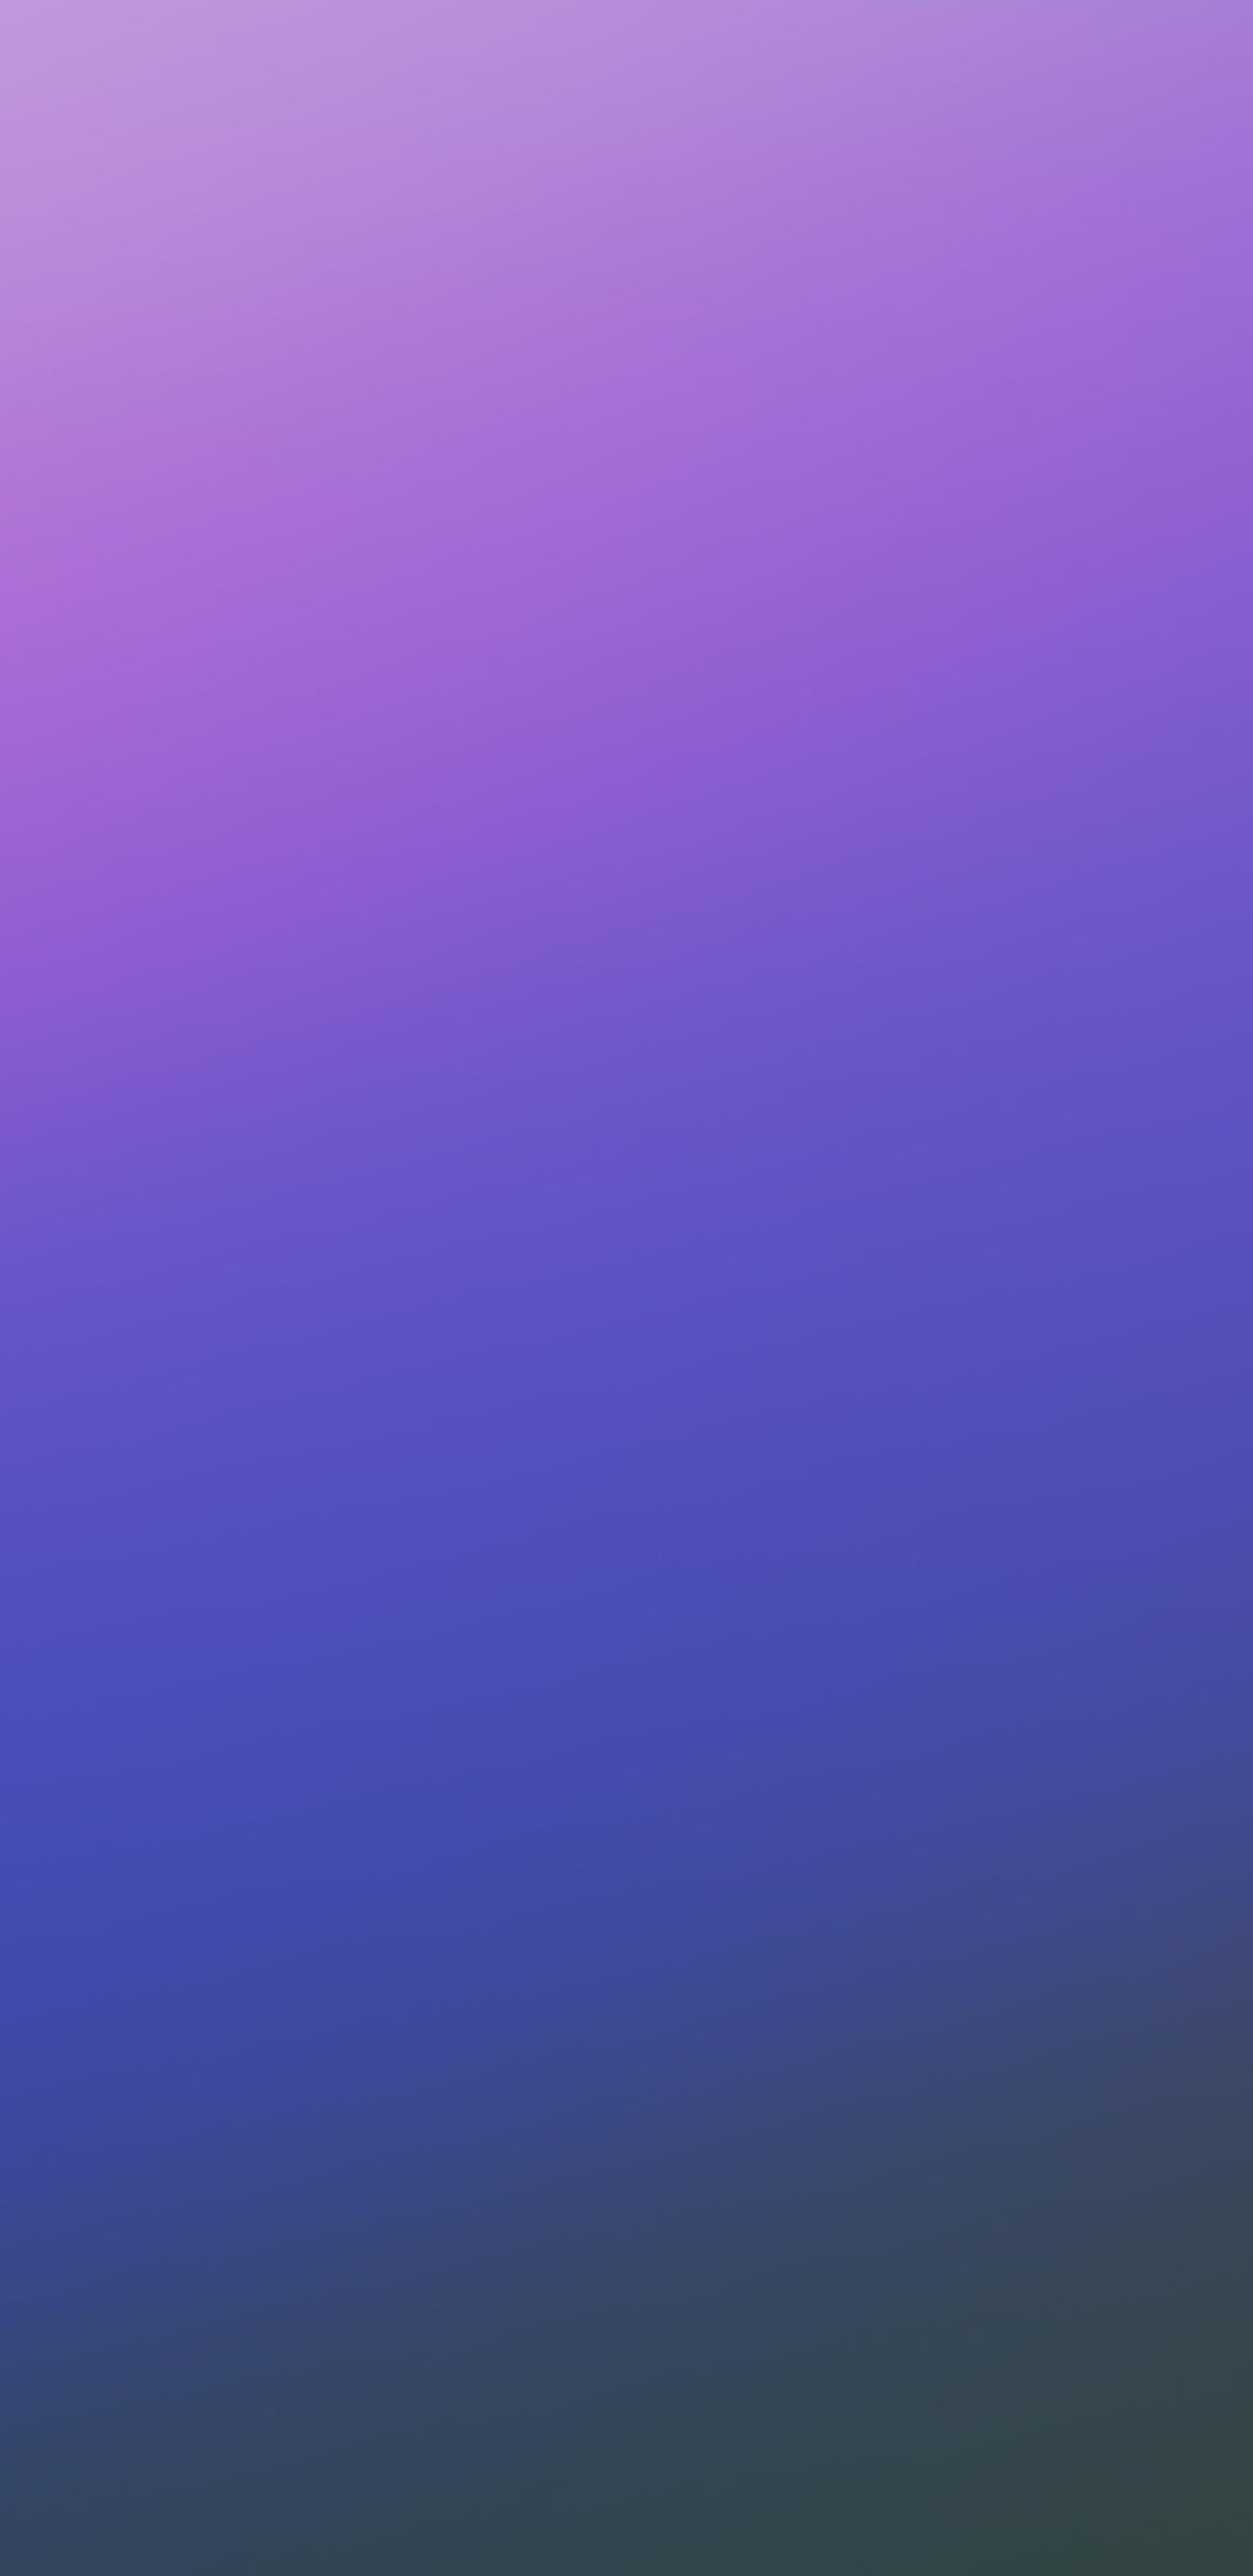 Download 1440x2960 Wallpaper Blur Gradient Purple Violet Digital Art Samsung Galaxy S8 Samsung Galaxy S8 Plus 1440x2960 Hd Image Background 8085